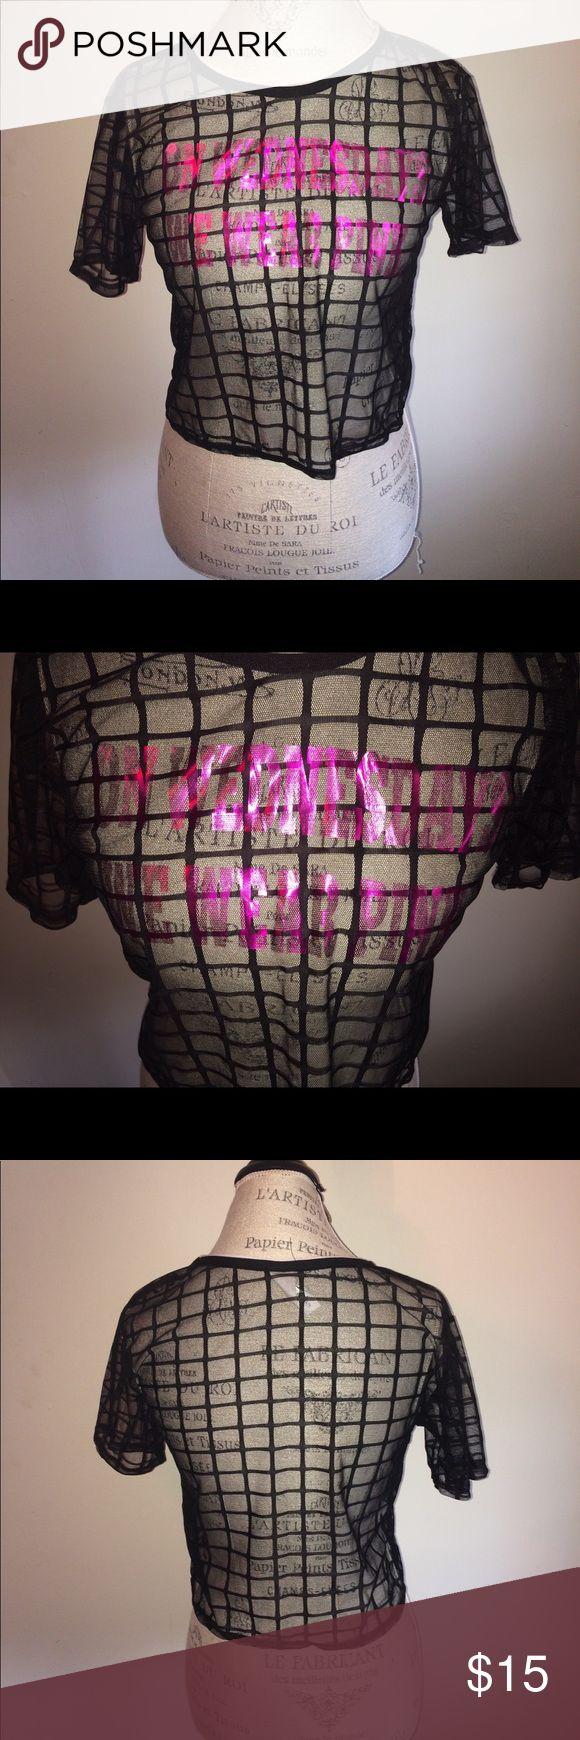 "Black Sheer ""Mean Girls"" Crop Top Black sheer crop top with the words ""On Wednesdays We Wear Pink"" printed on front Tops Crop Tops"